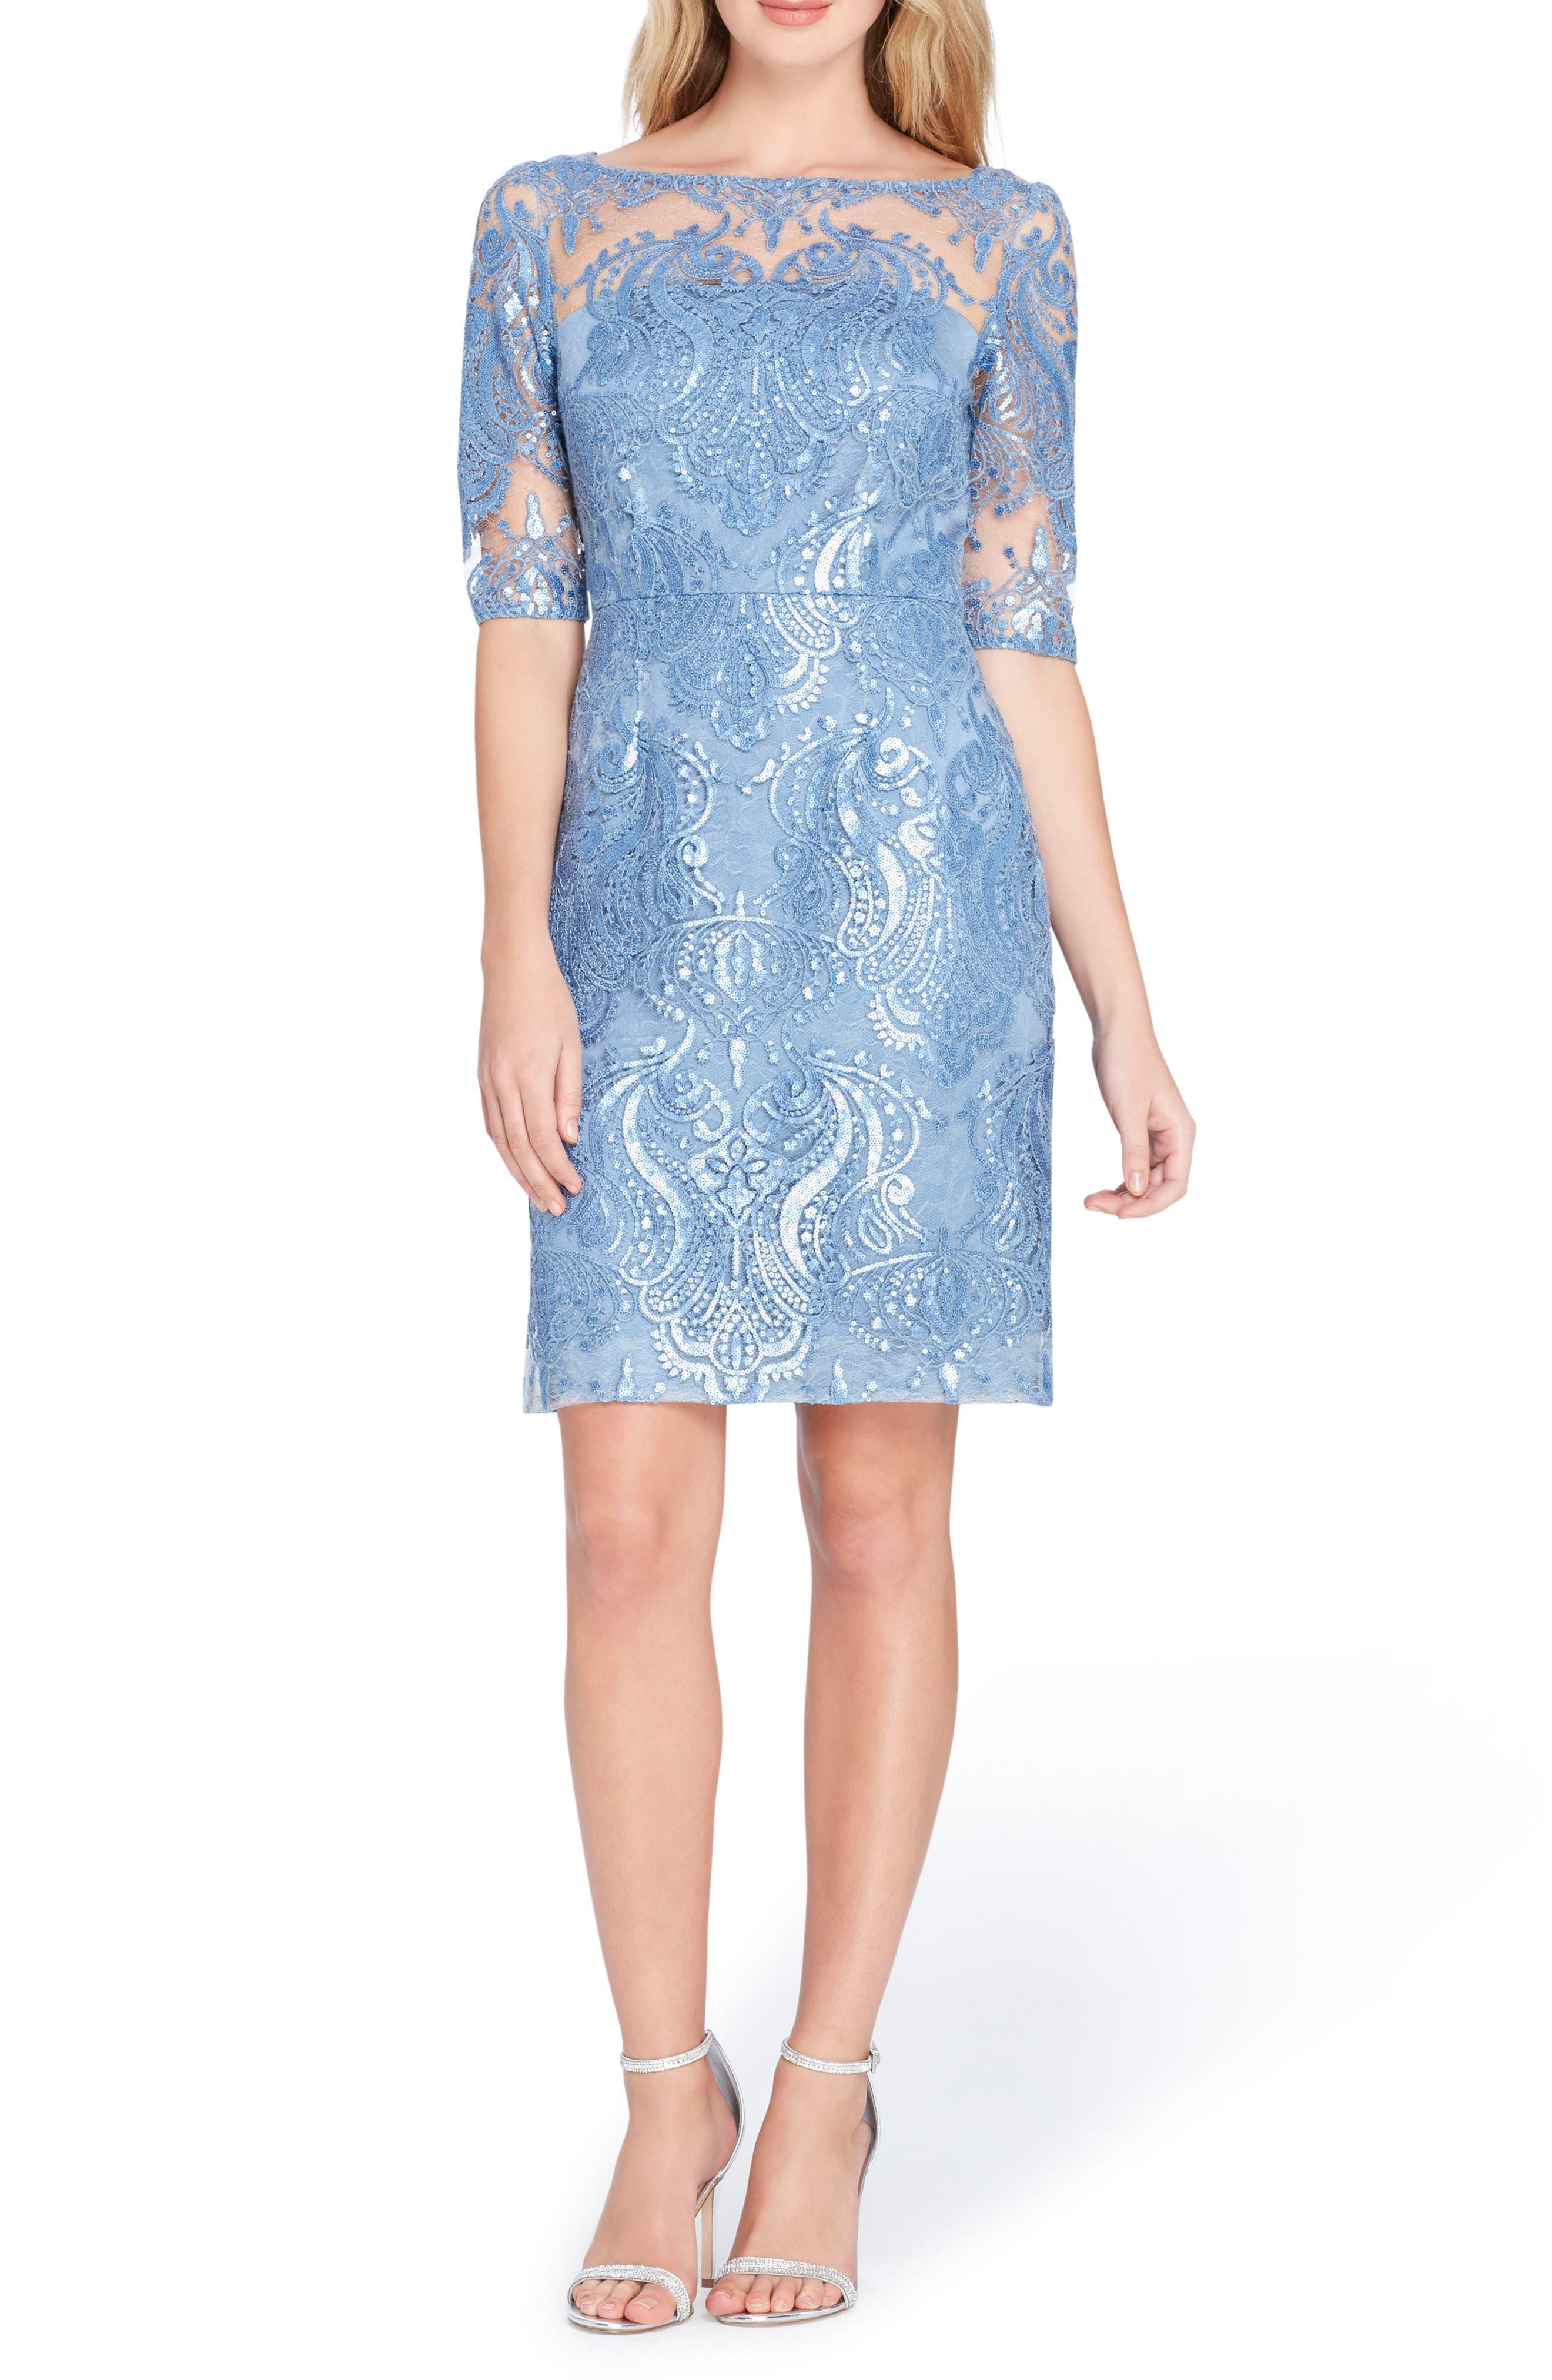 Sequin Sheath Dress,                         Main,                         color, Periwinkle